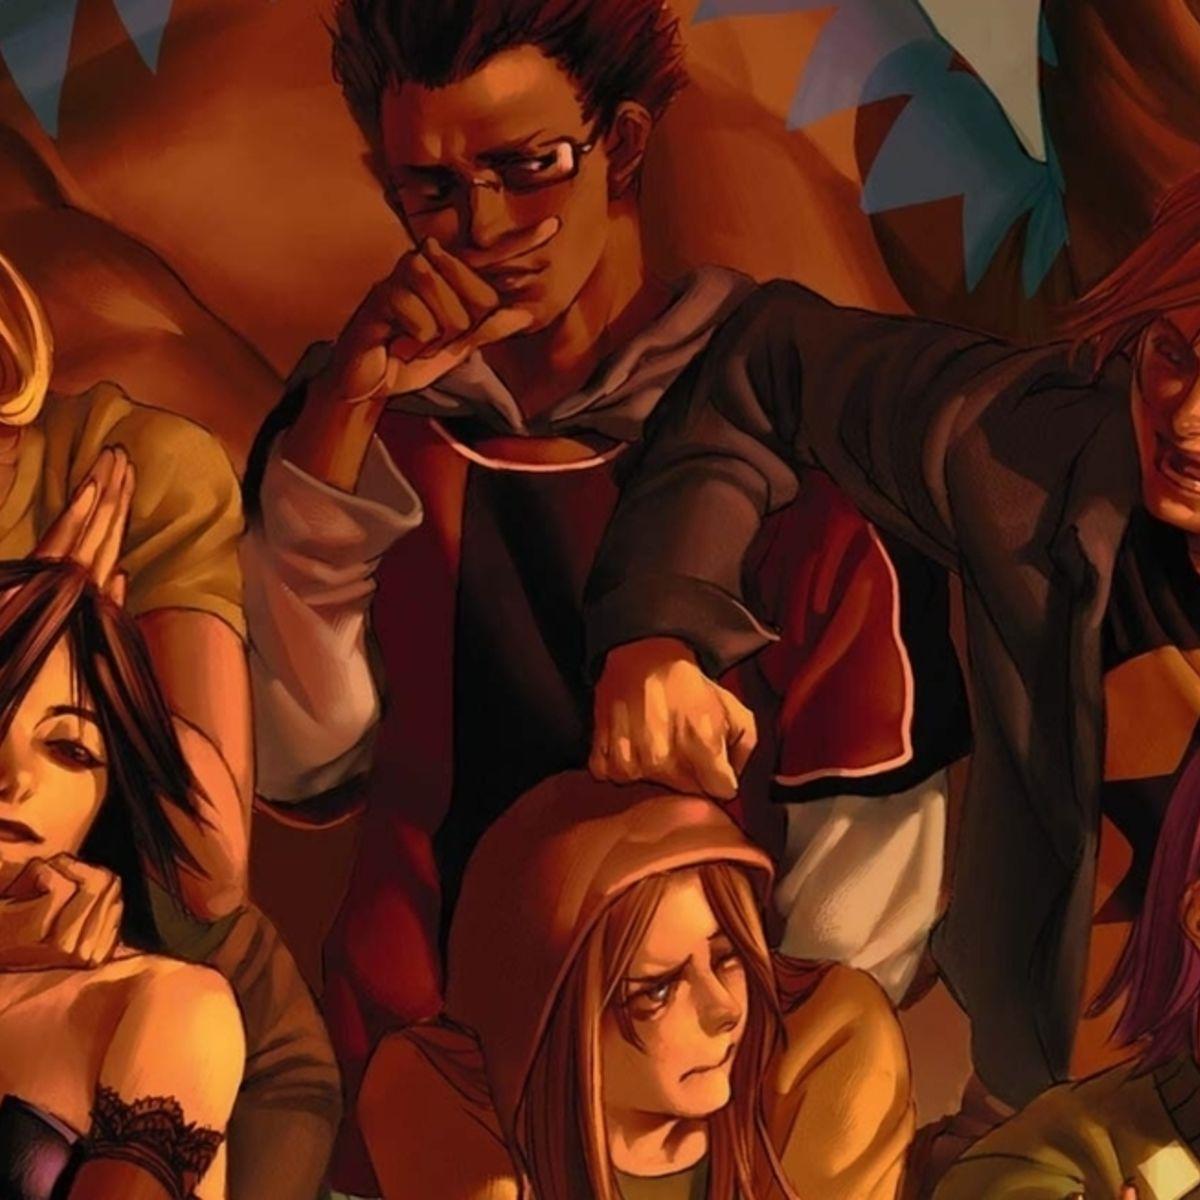 marvel_comics_runaways_01.jpg